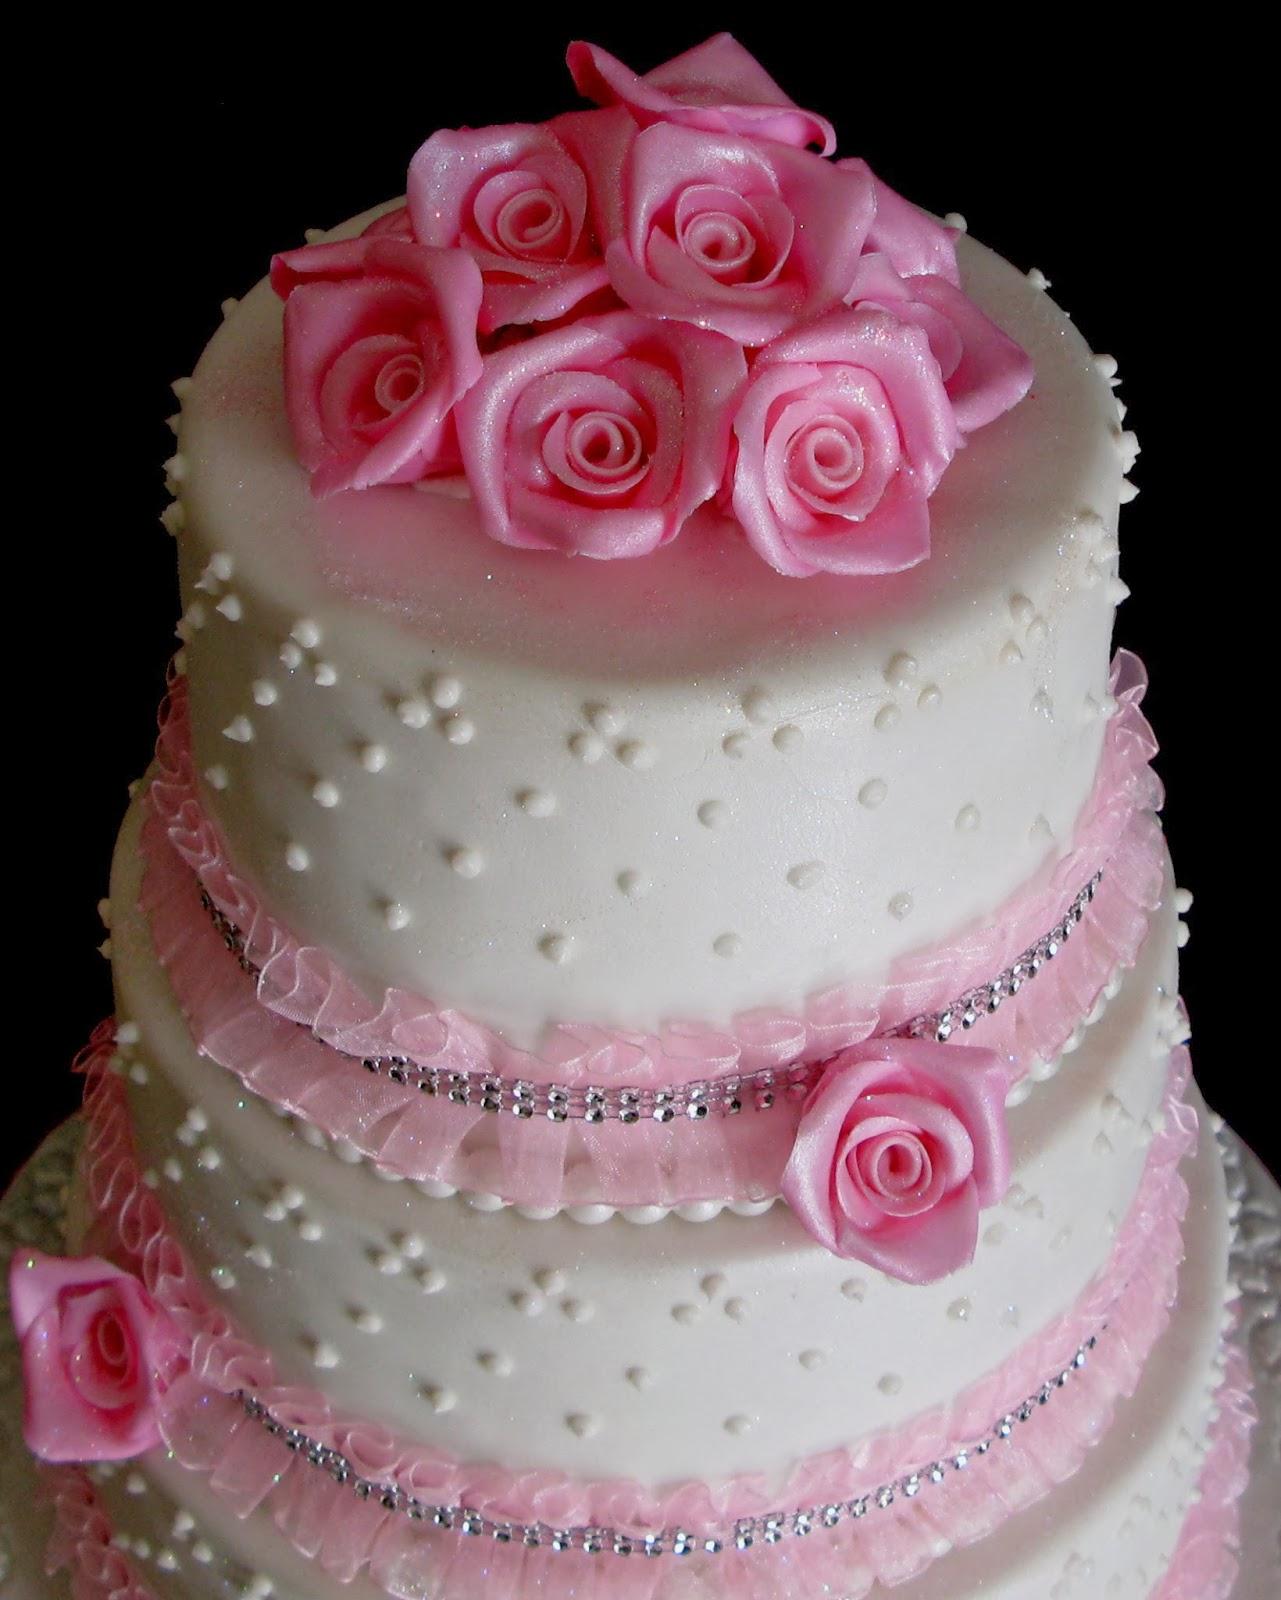 Sugarcraft by Soni: Three Layer Wedding Cake : Pink Roses